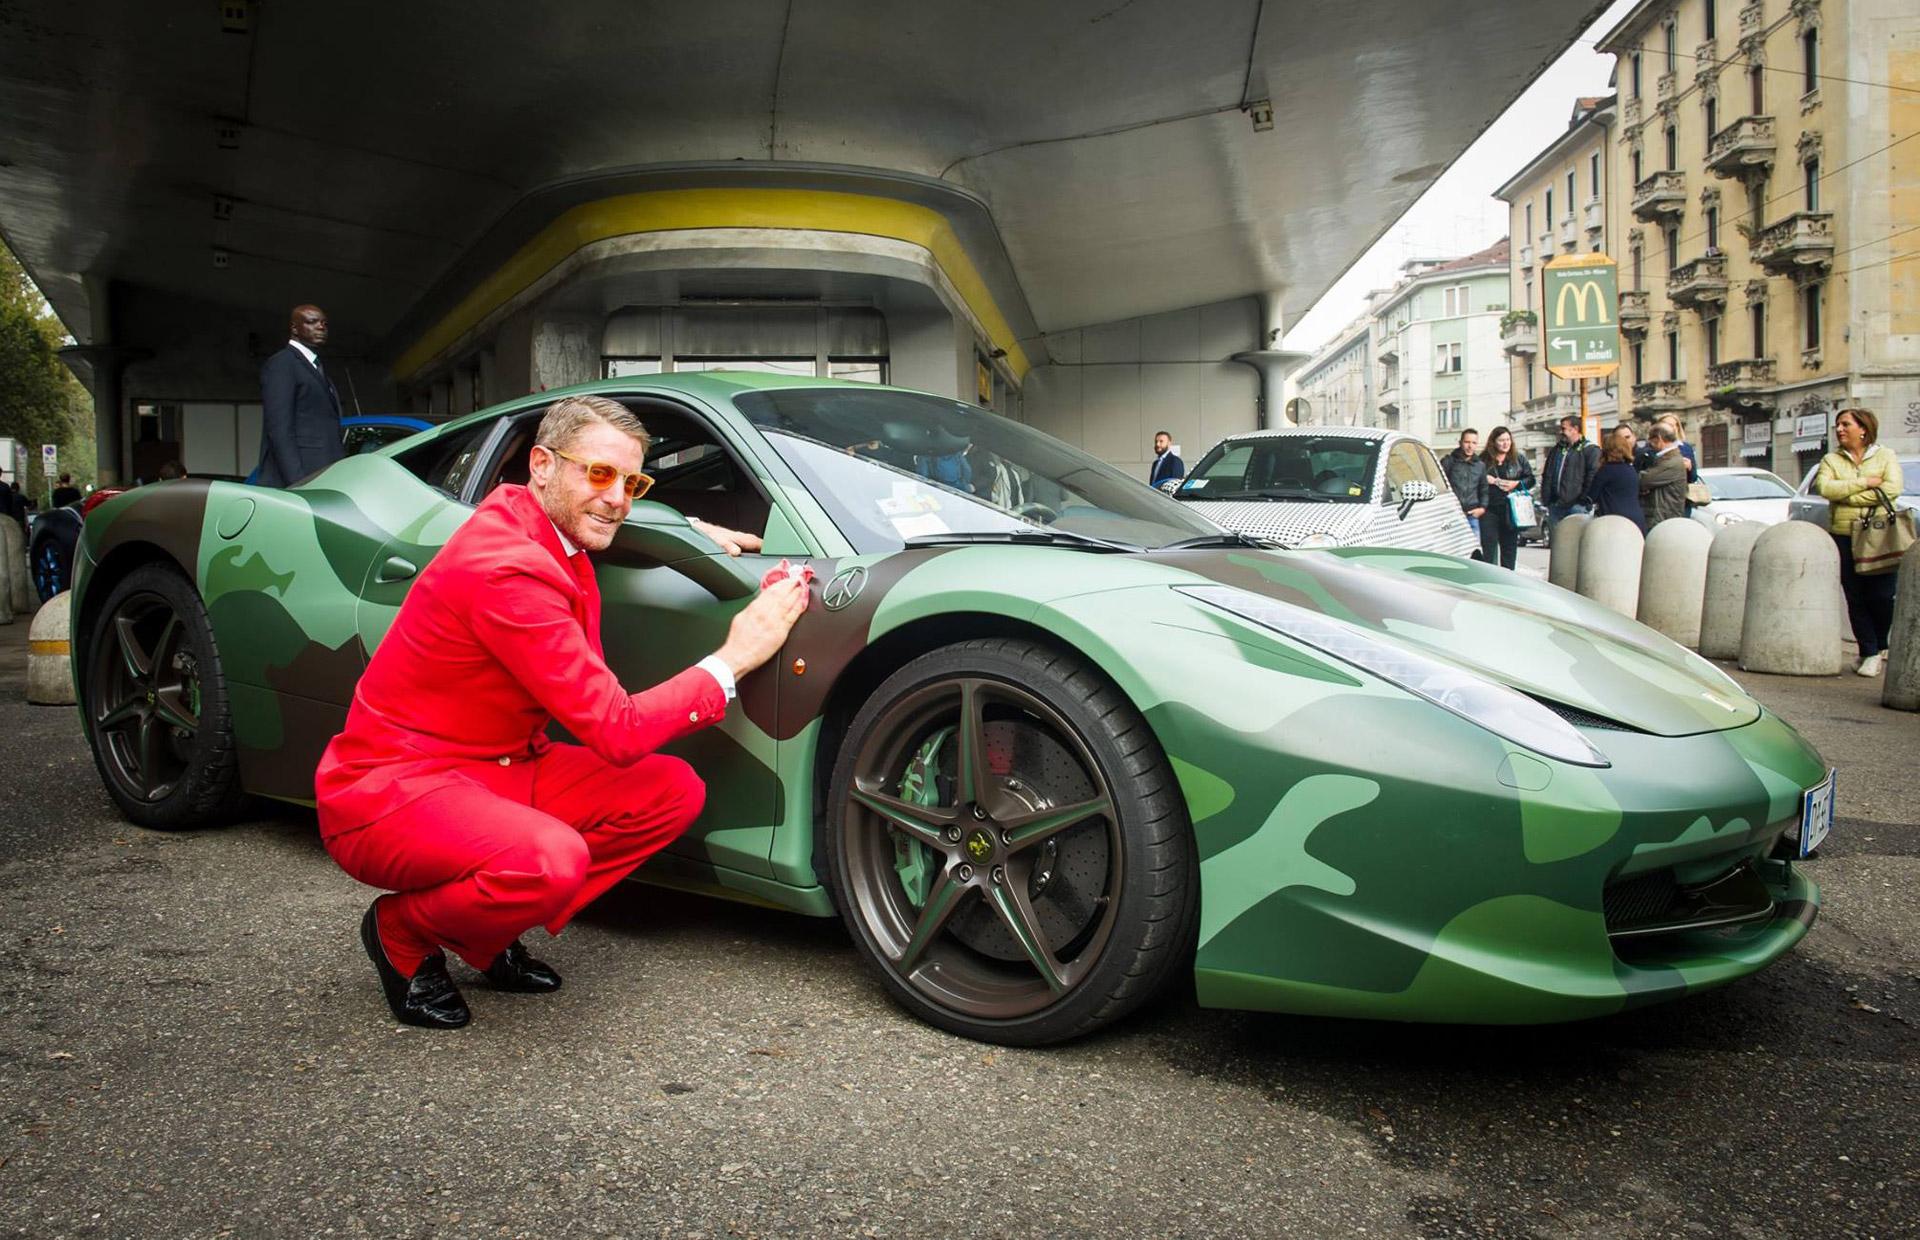 Fiat Heir Lapo Elkann Turns Milan Gas Station Into Trendy Vehicle Customization Shop